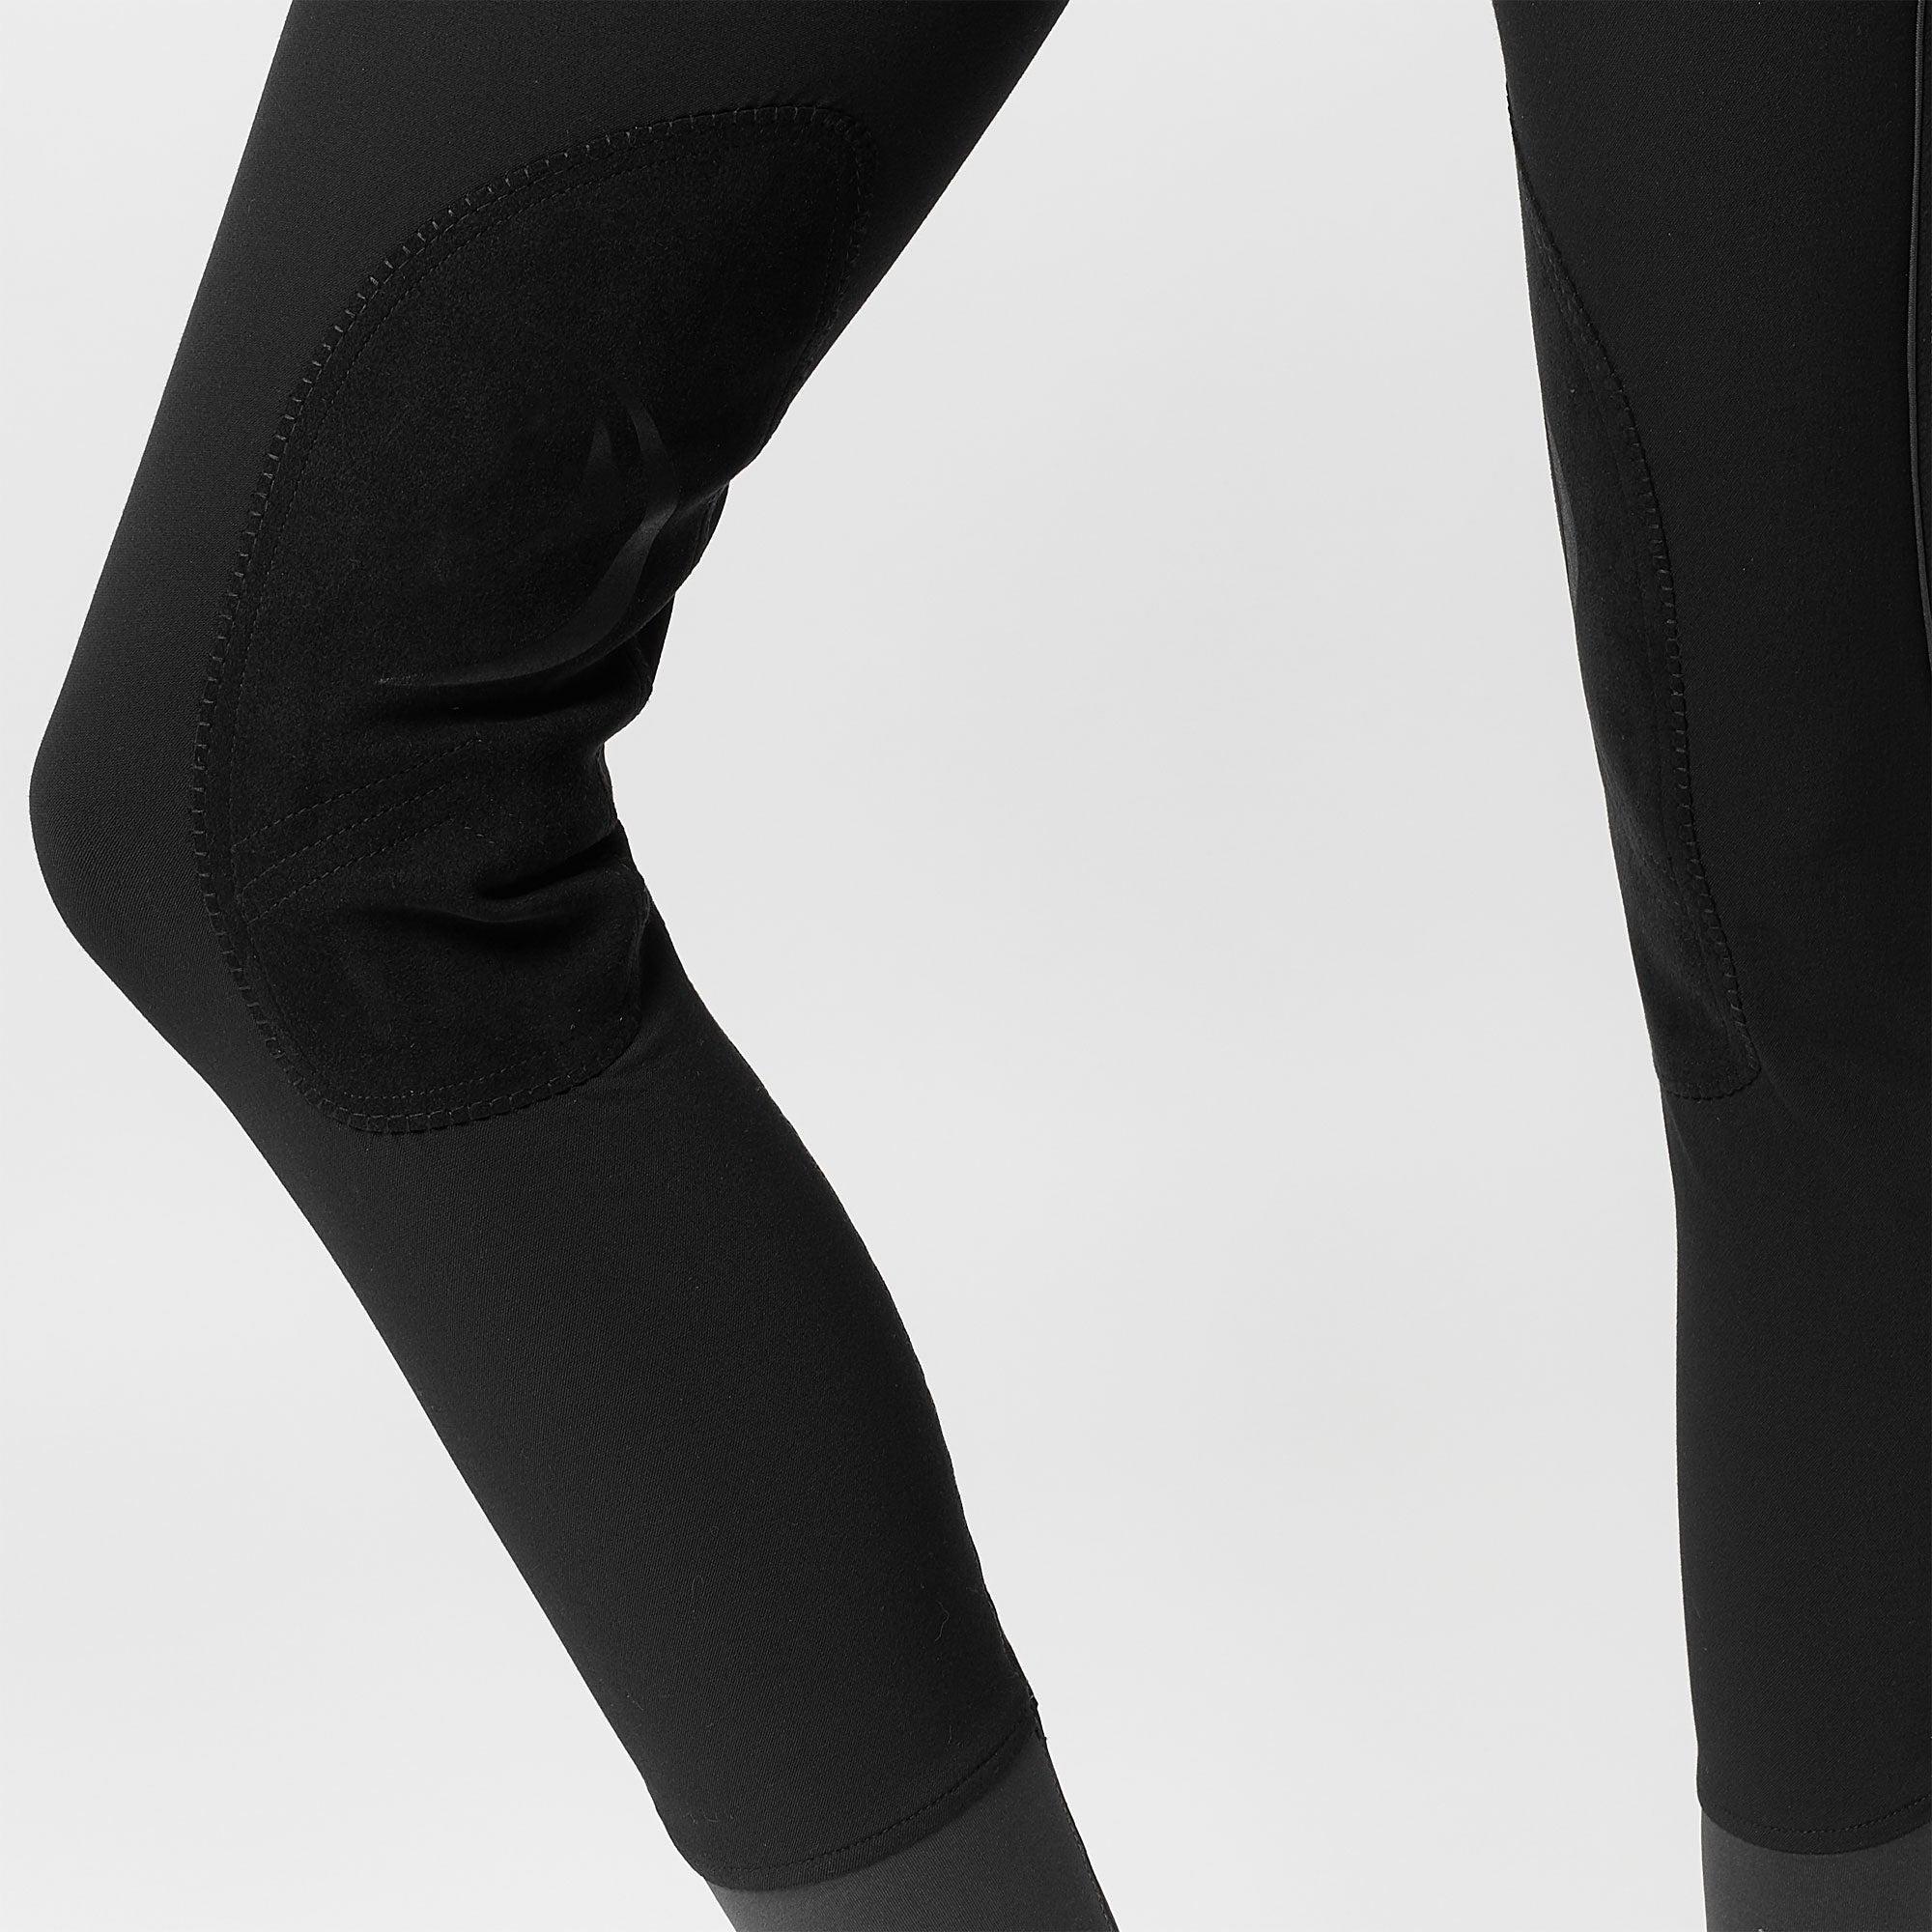 Devon Aire Signature Madrid Woven Kneepatch Breeches